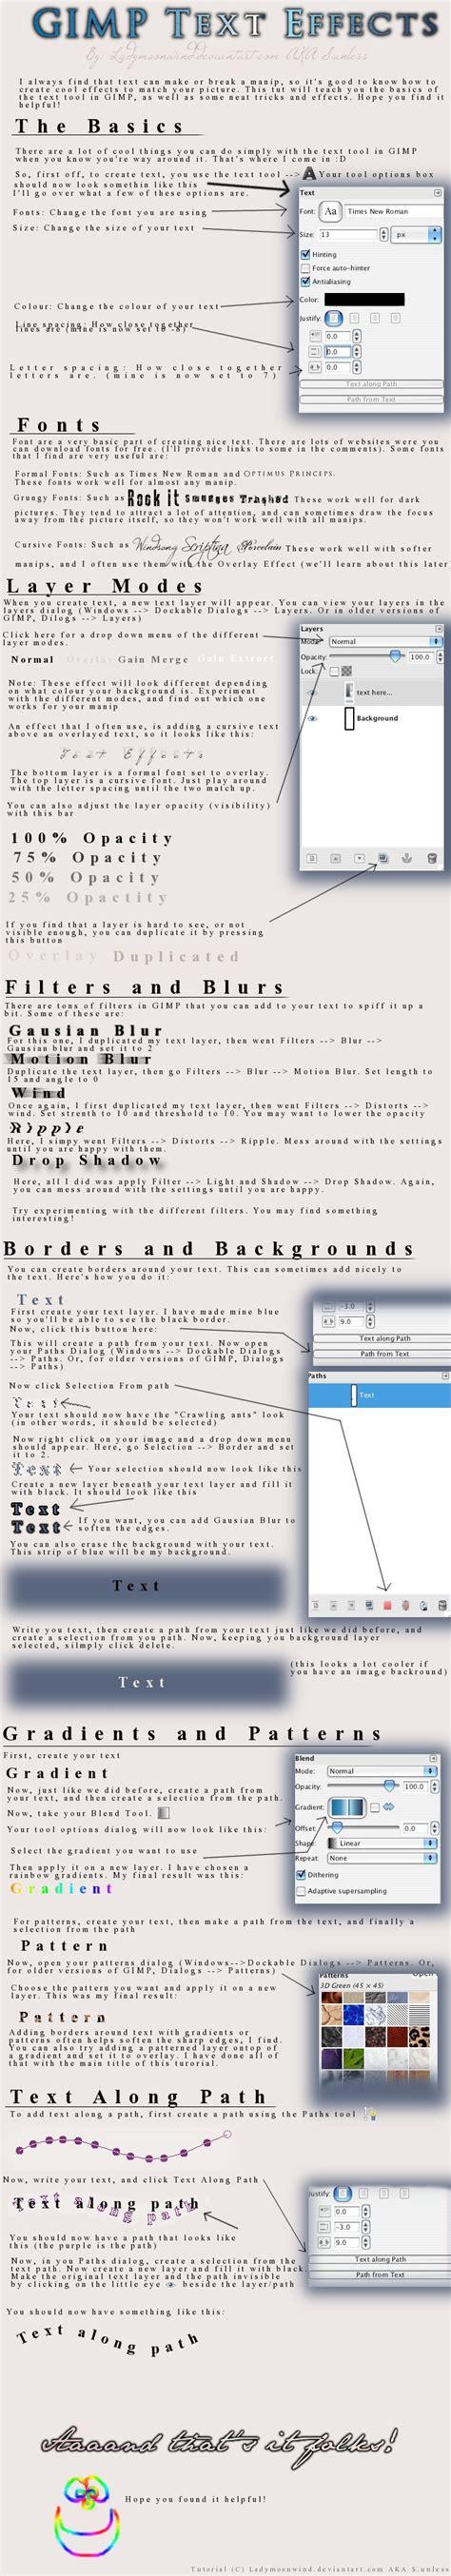 gimp tutorials bing images gimp text tutorials bing images